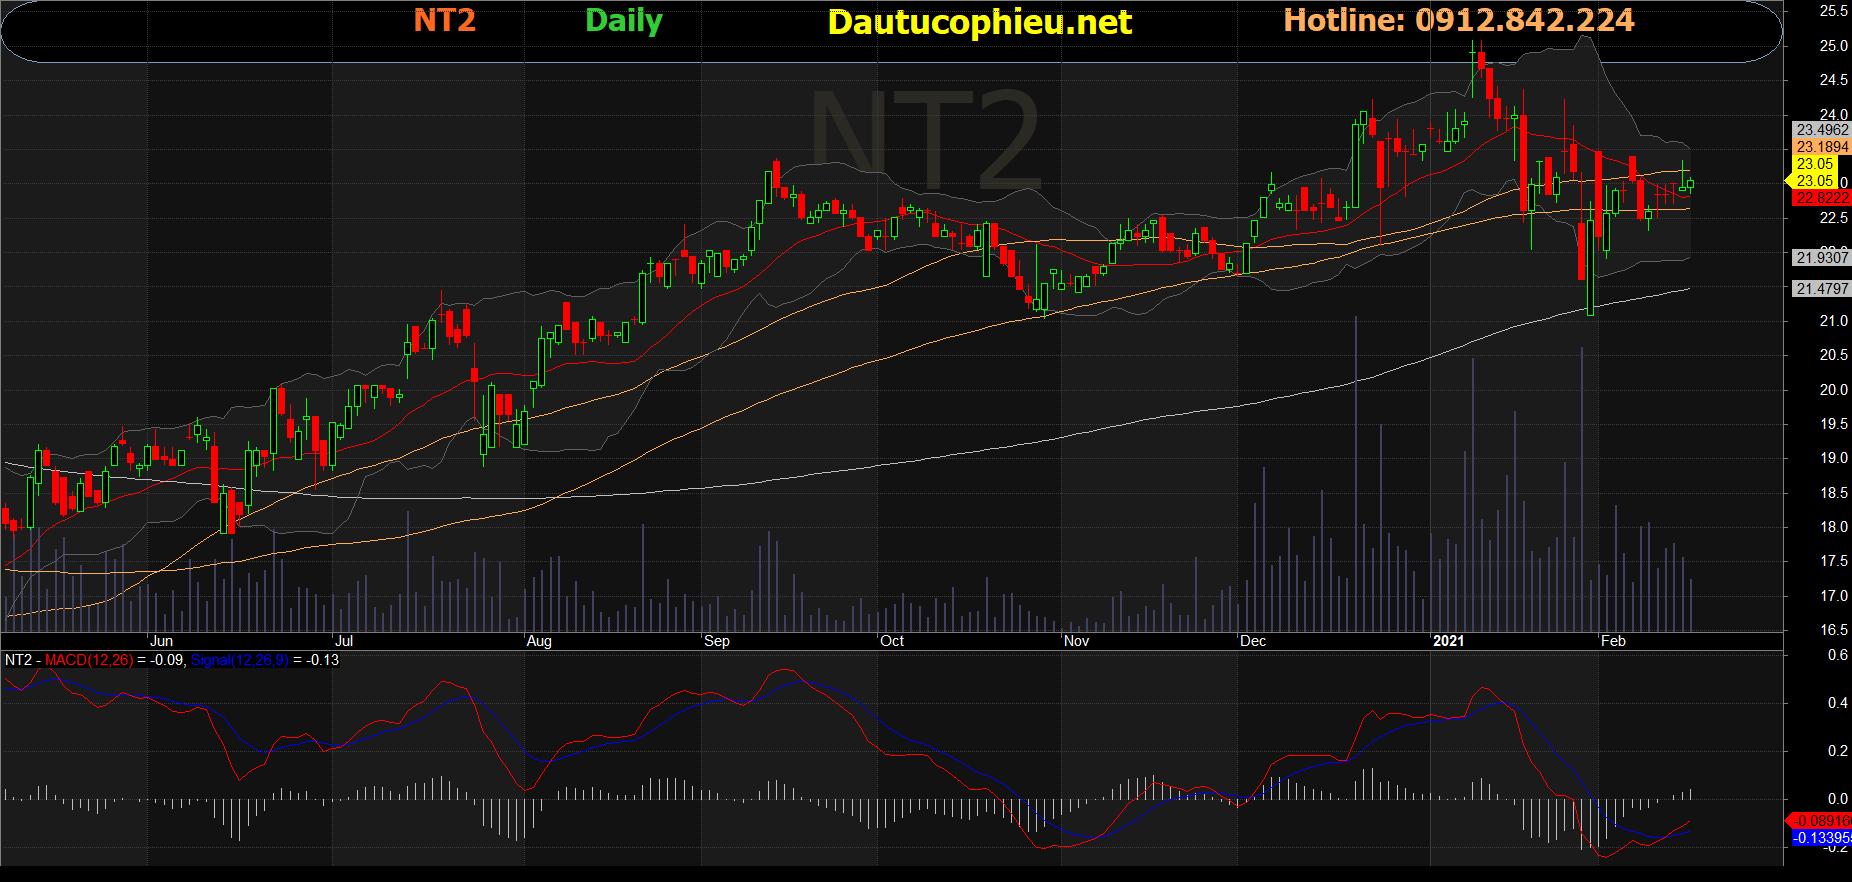 Cổ phiếu NT2